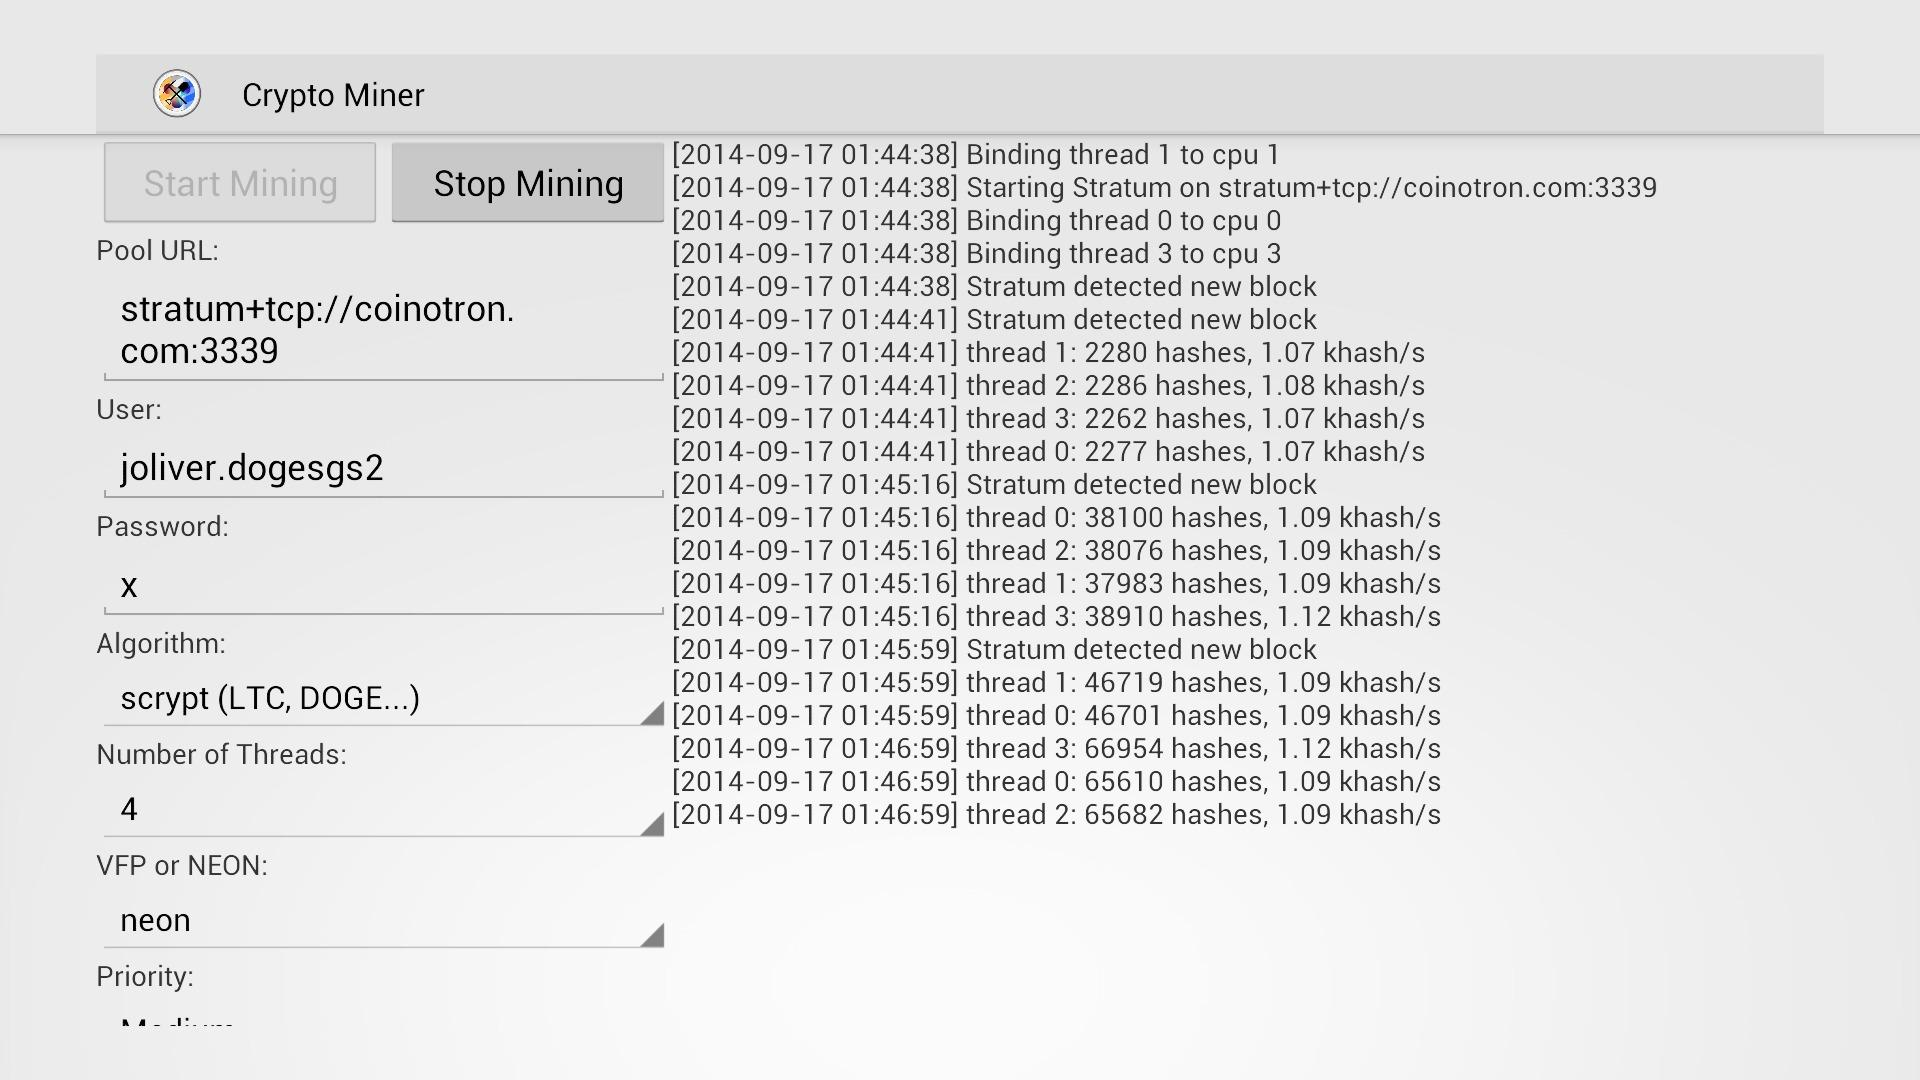 Screenshot of Crypto Miner